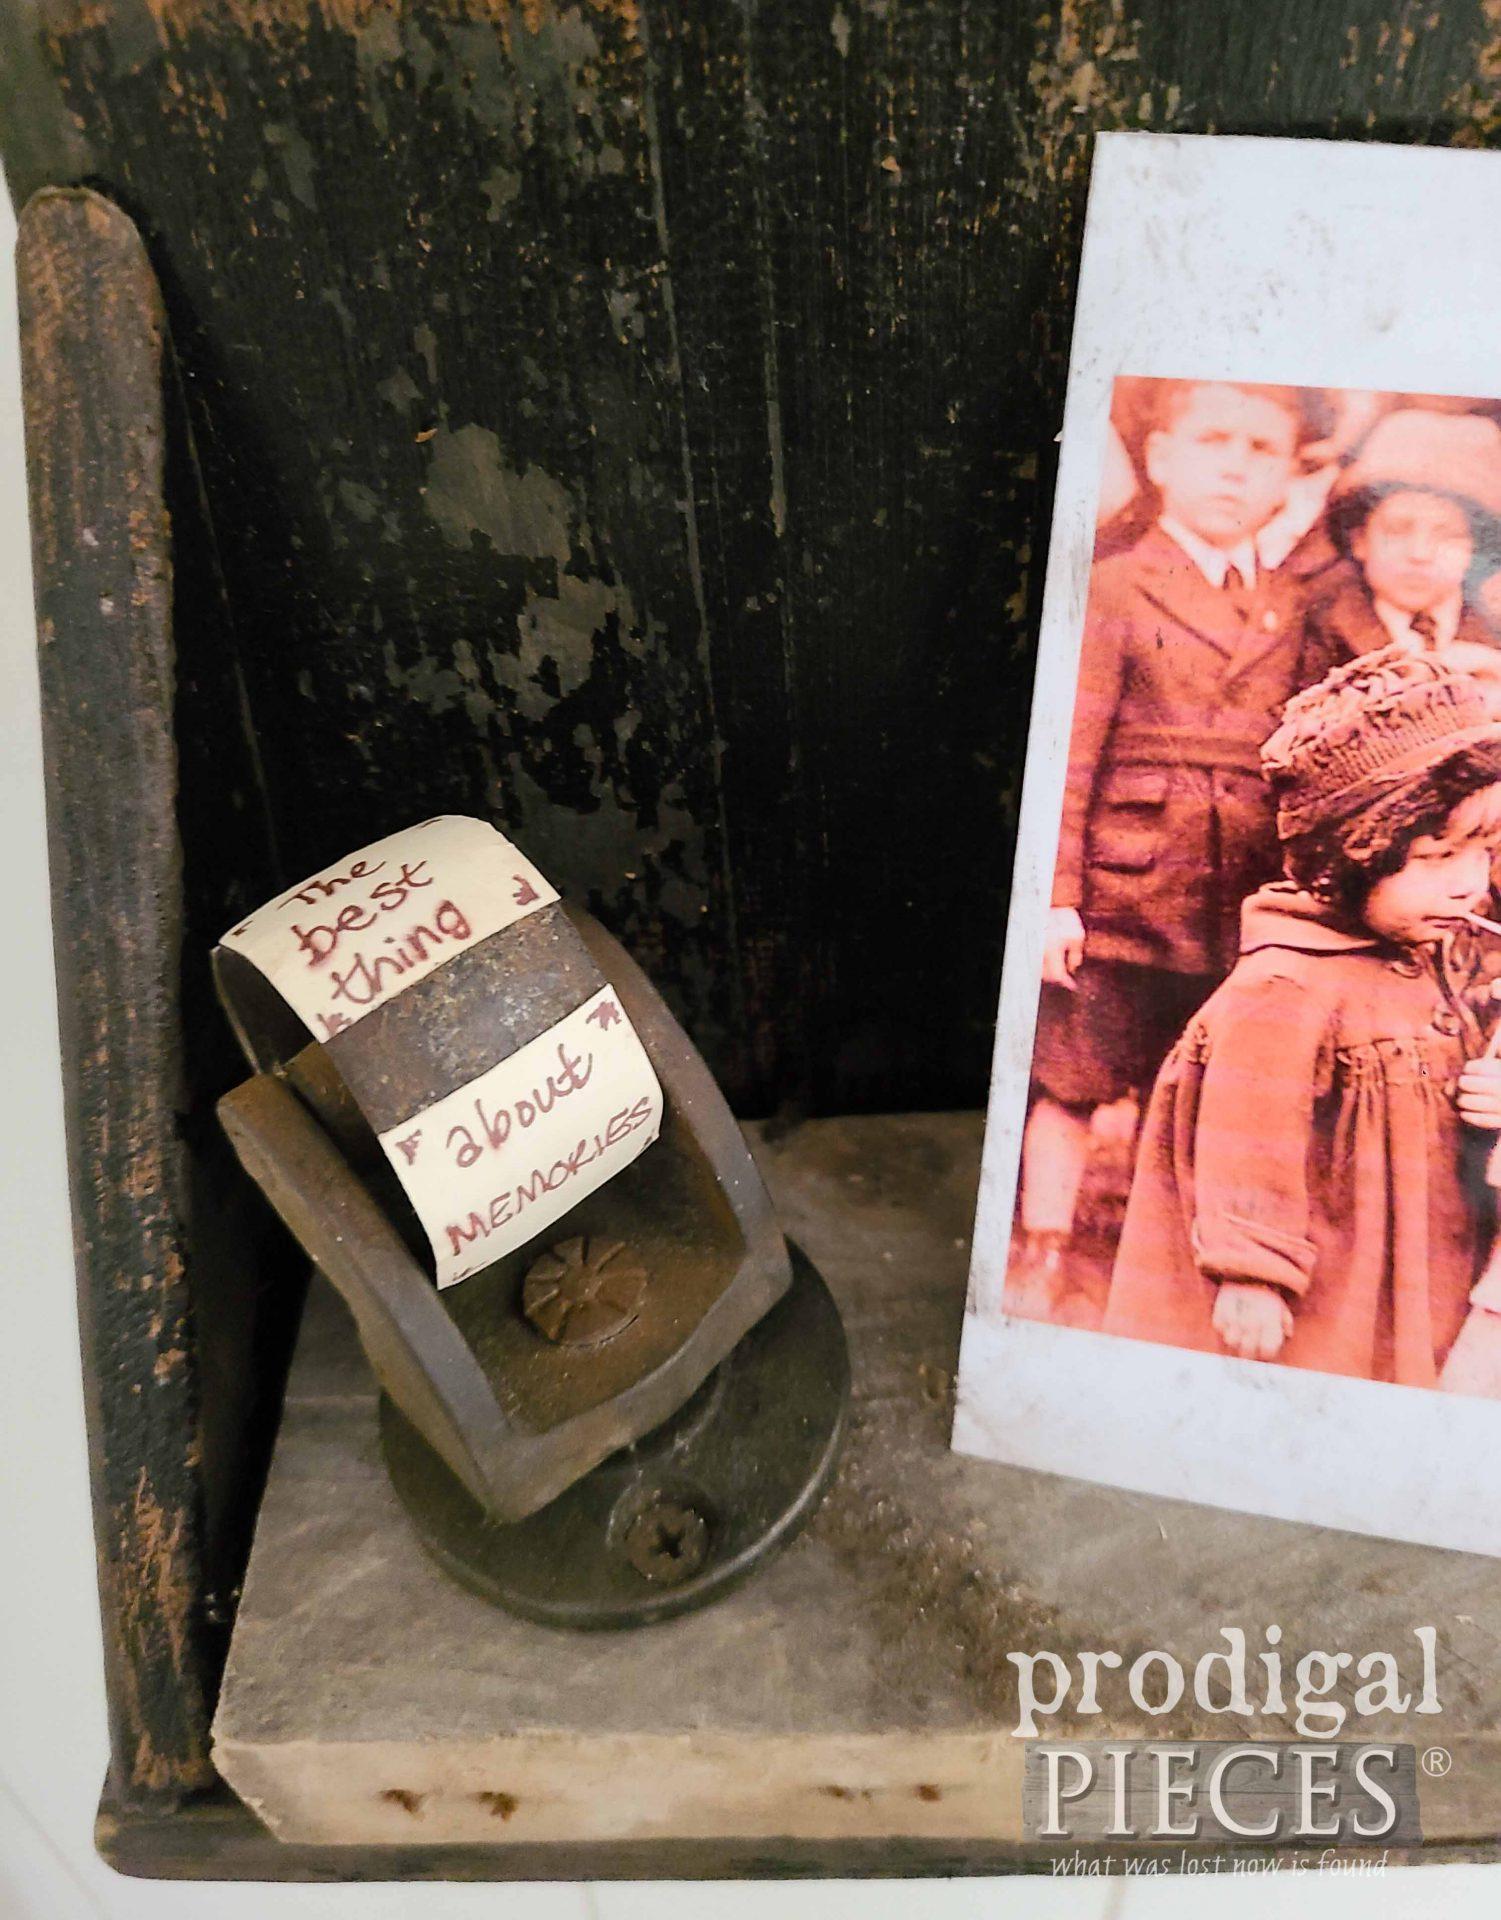 Antique Caster with Memory Quote for Rustic Chic Home Decor   prodigalpieces.com #prodigalpieces #antique #farmhouse